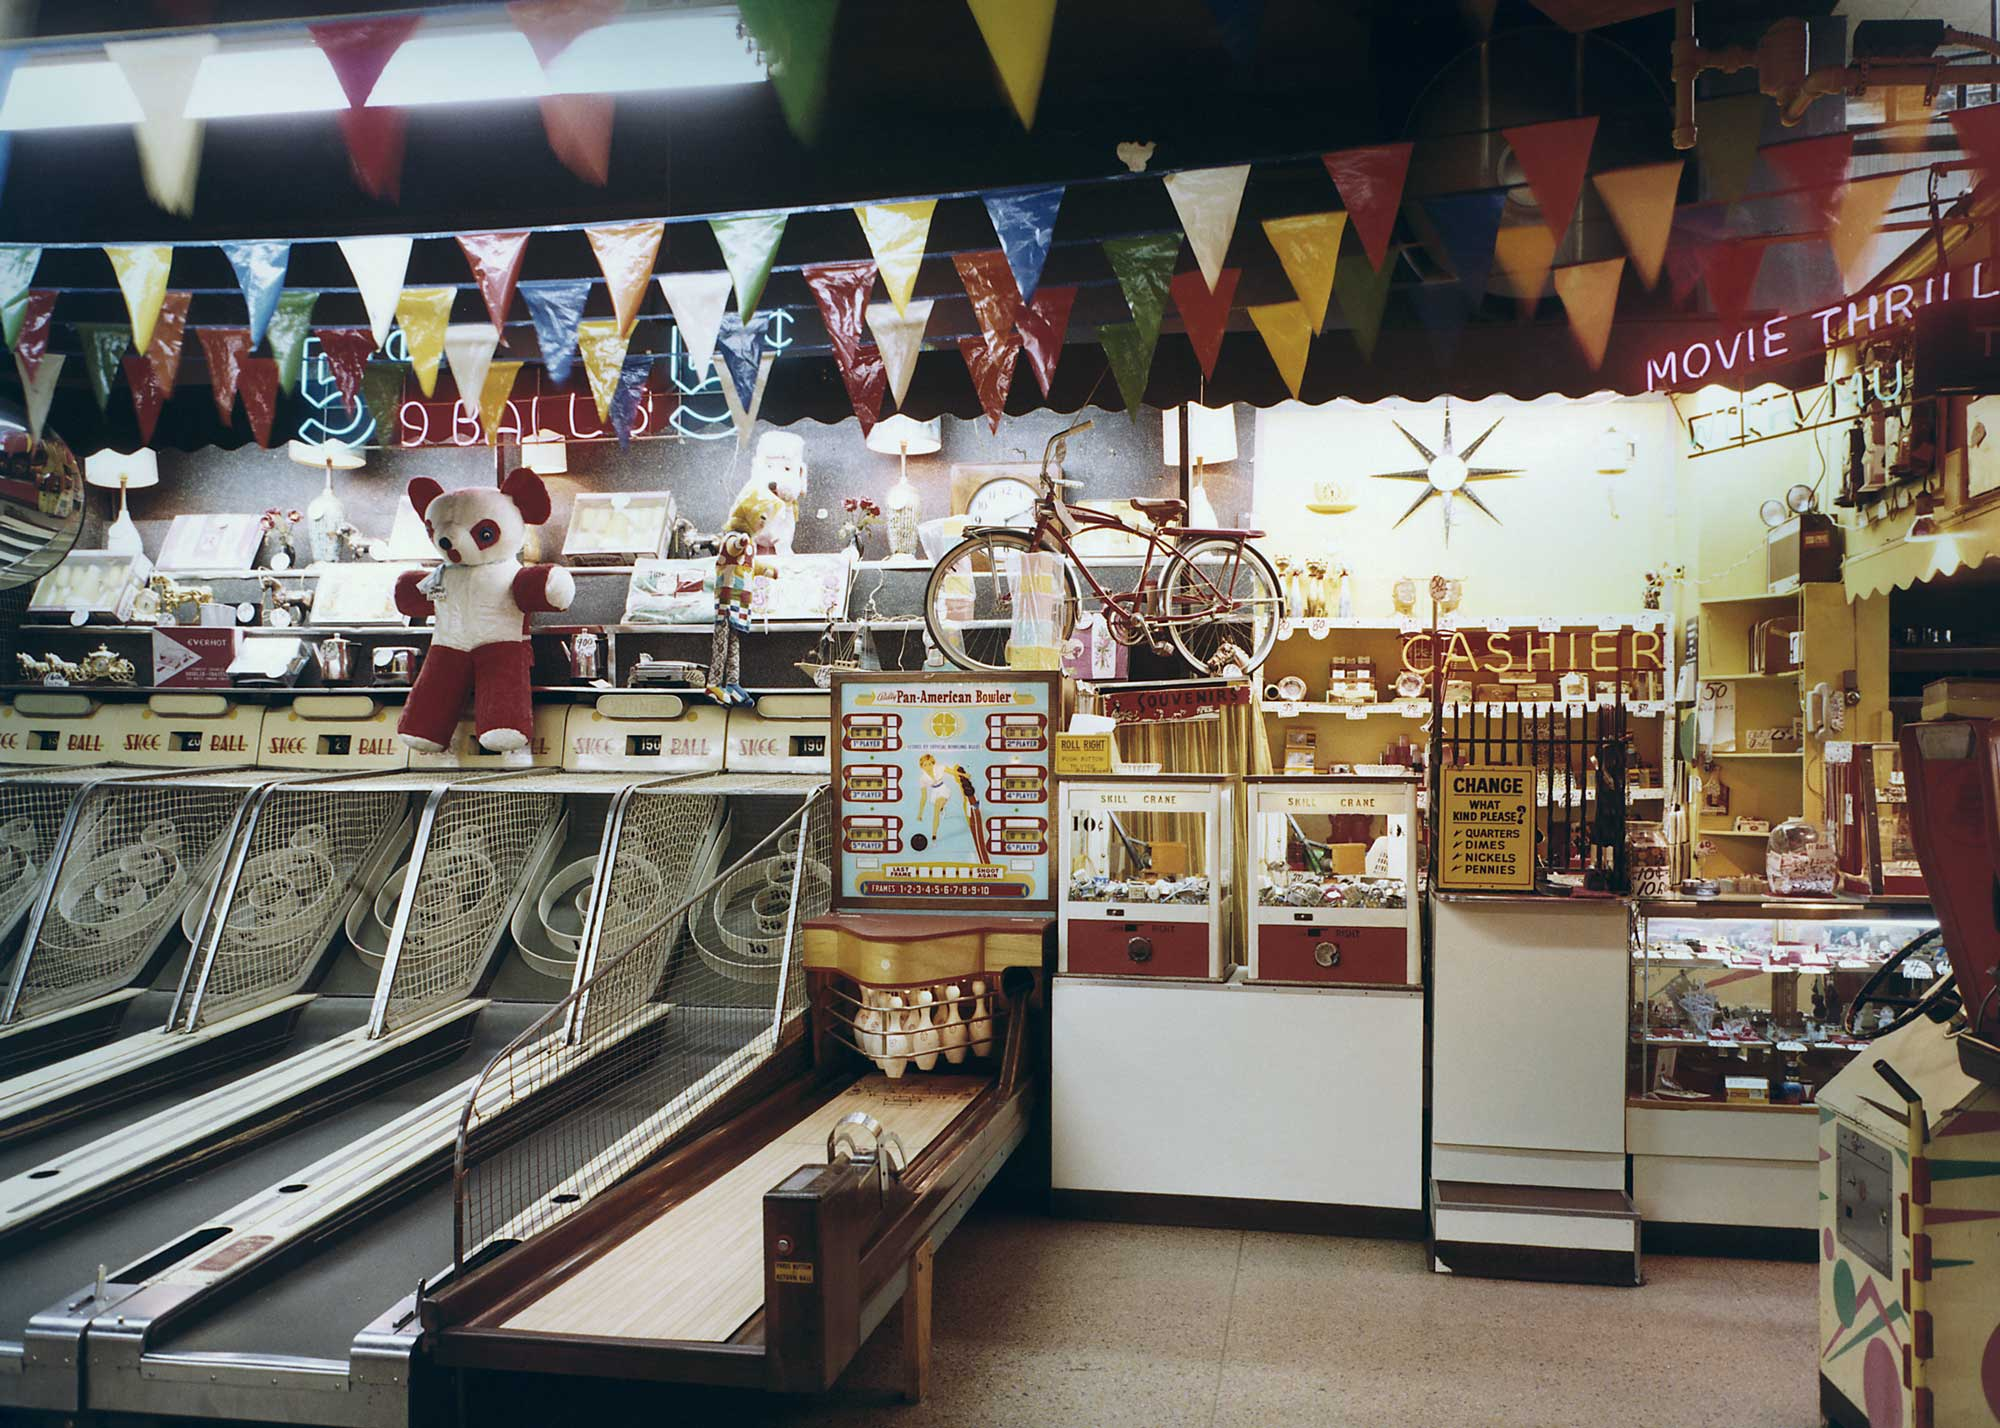 wonderland-arcade-5.jpg